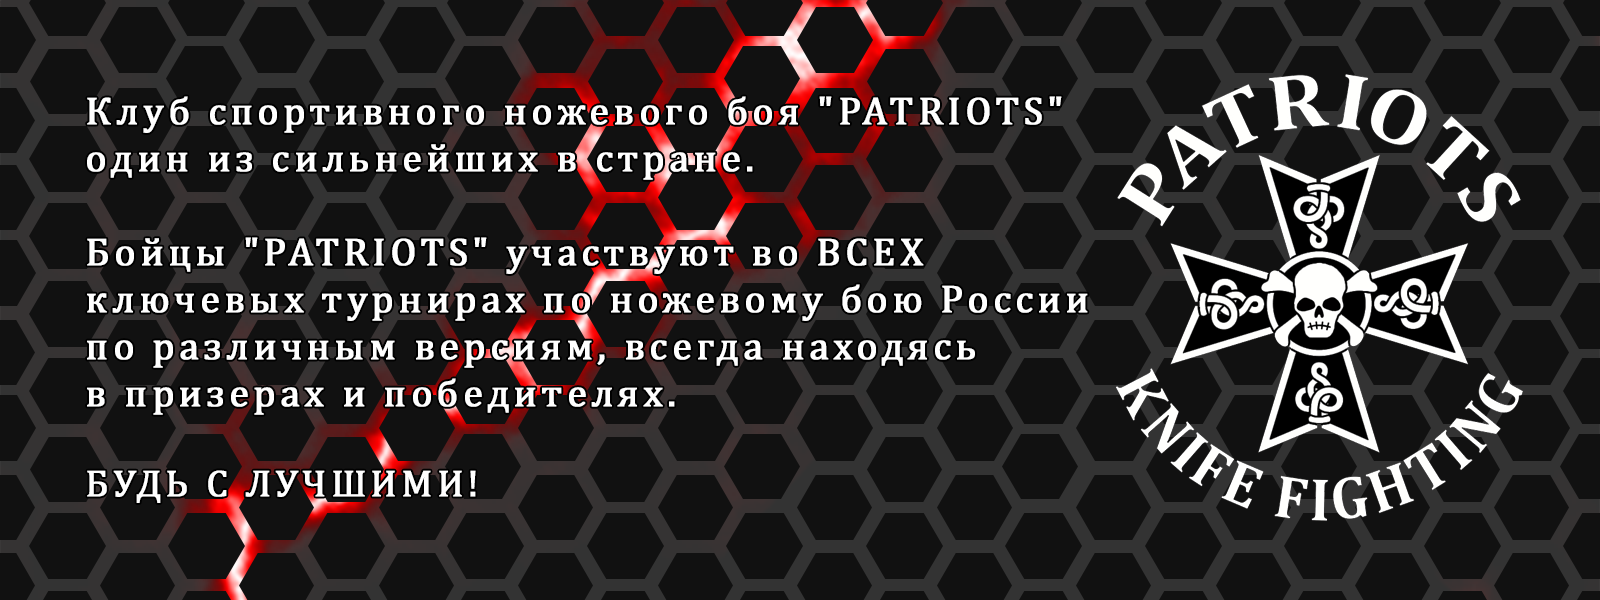 """PATRIOTS"" — Клуб спортивного ножевого боя."